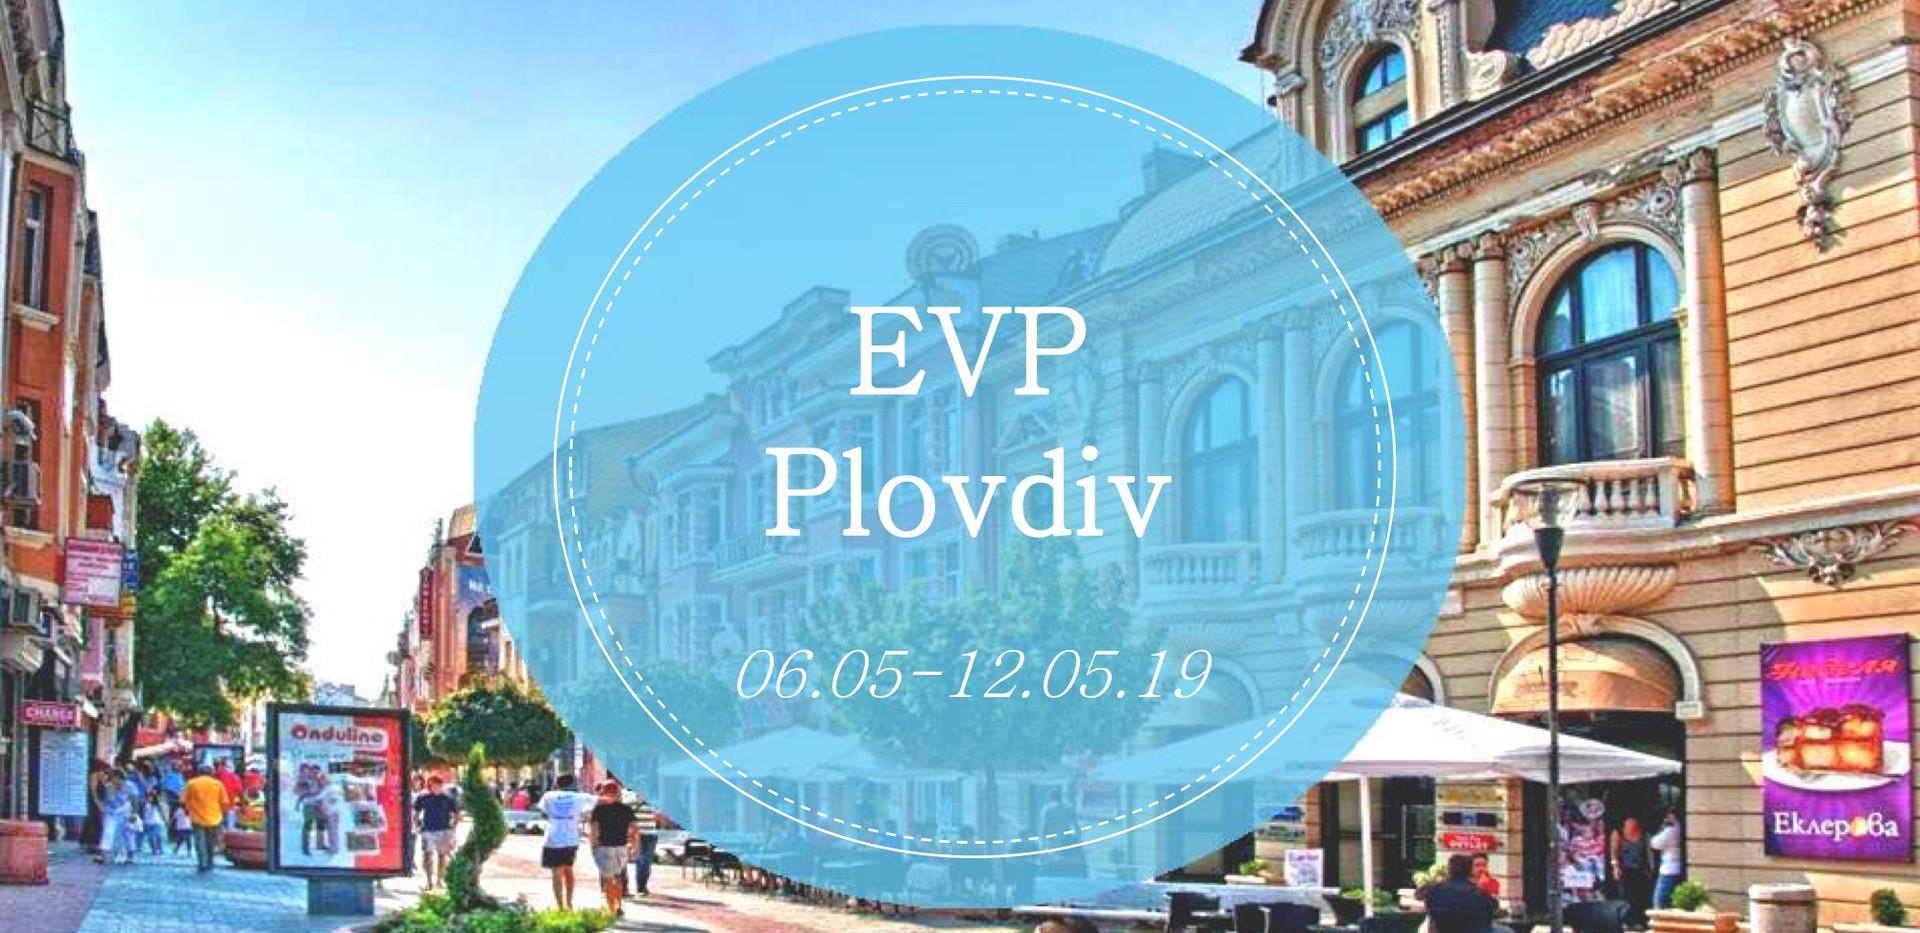 EVP_Plovdiv2019 (1) 1_9_2019.jpeg